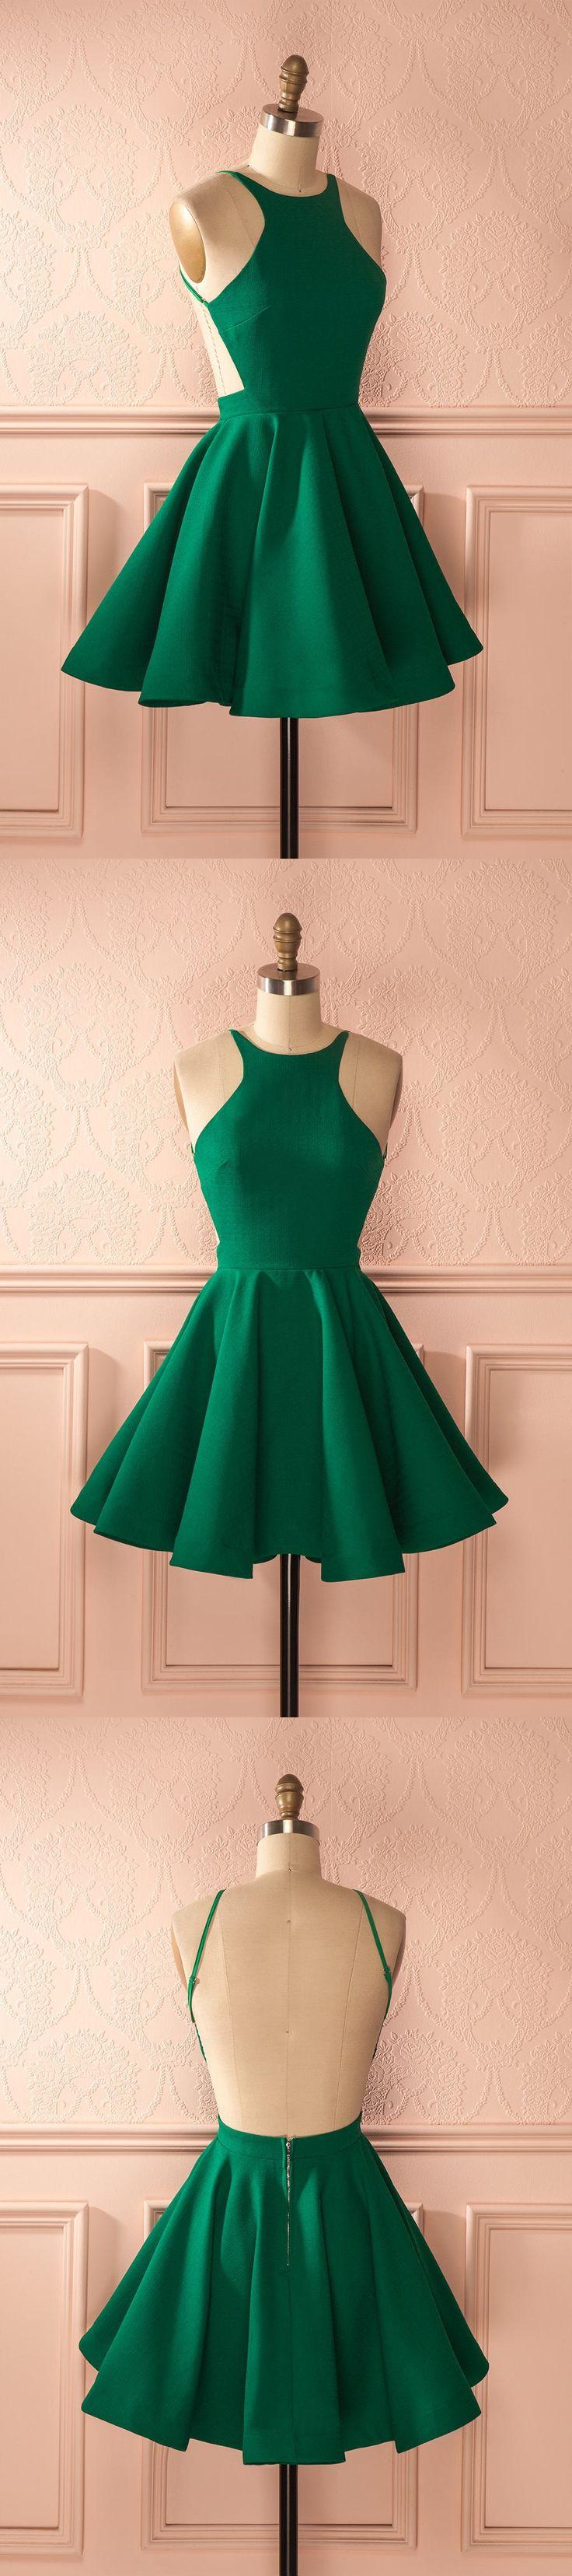 backless homecoming dresses, short homecoming dresses, green homecoming dresses, homecoming dress with pleats, 2017 homecoming #homecoming #greendress